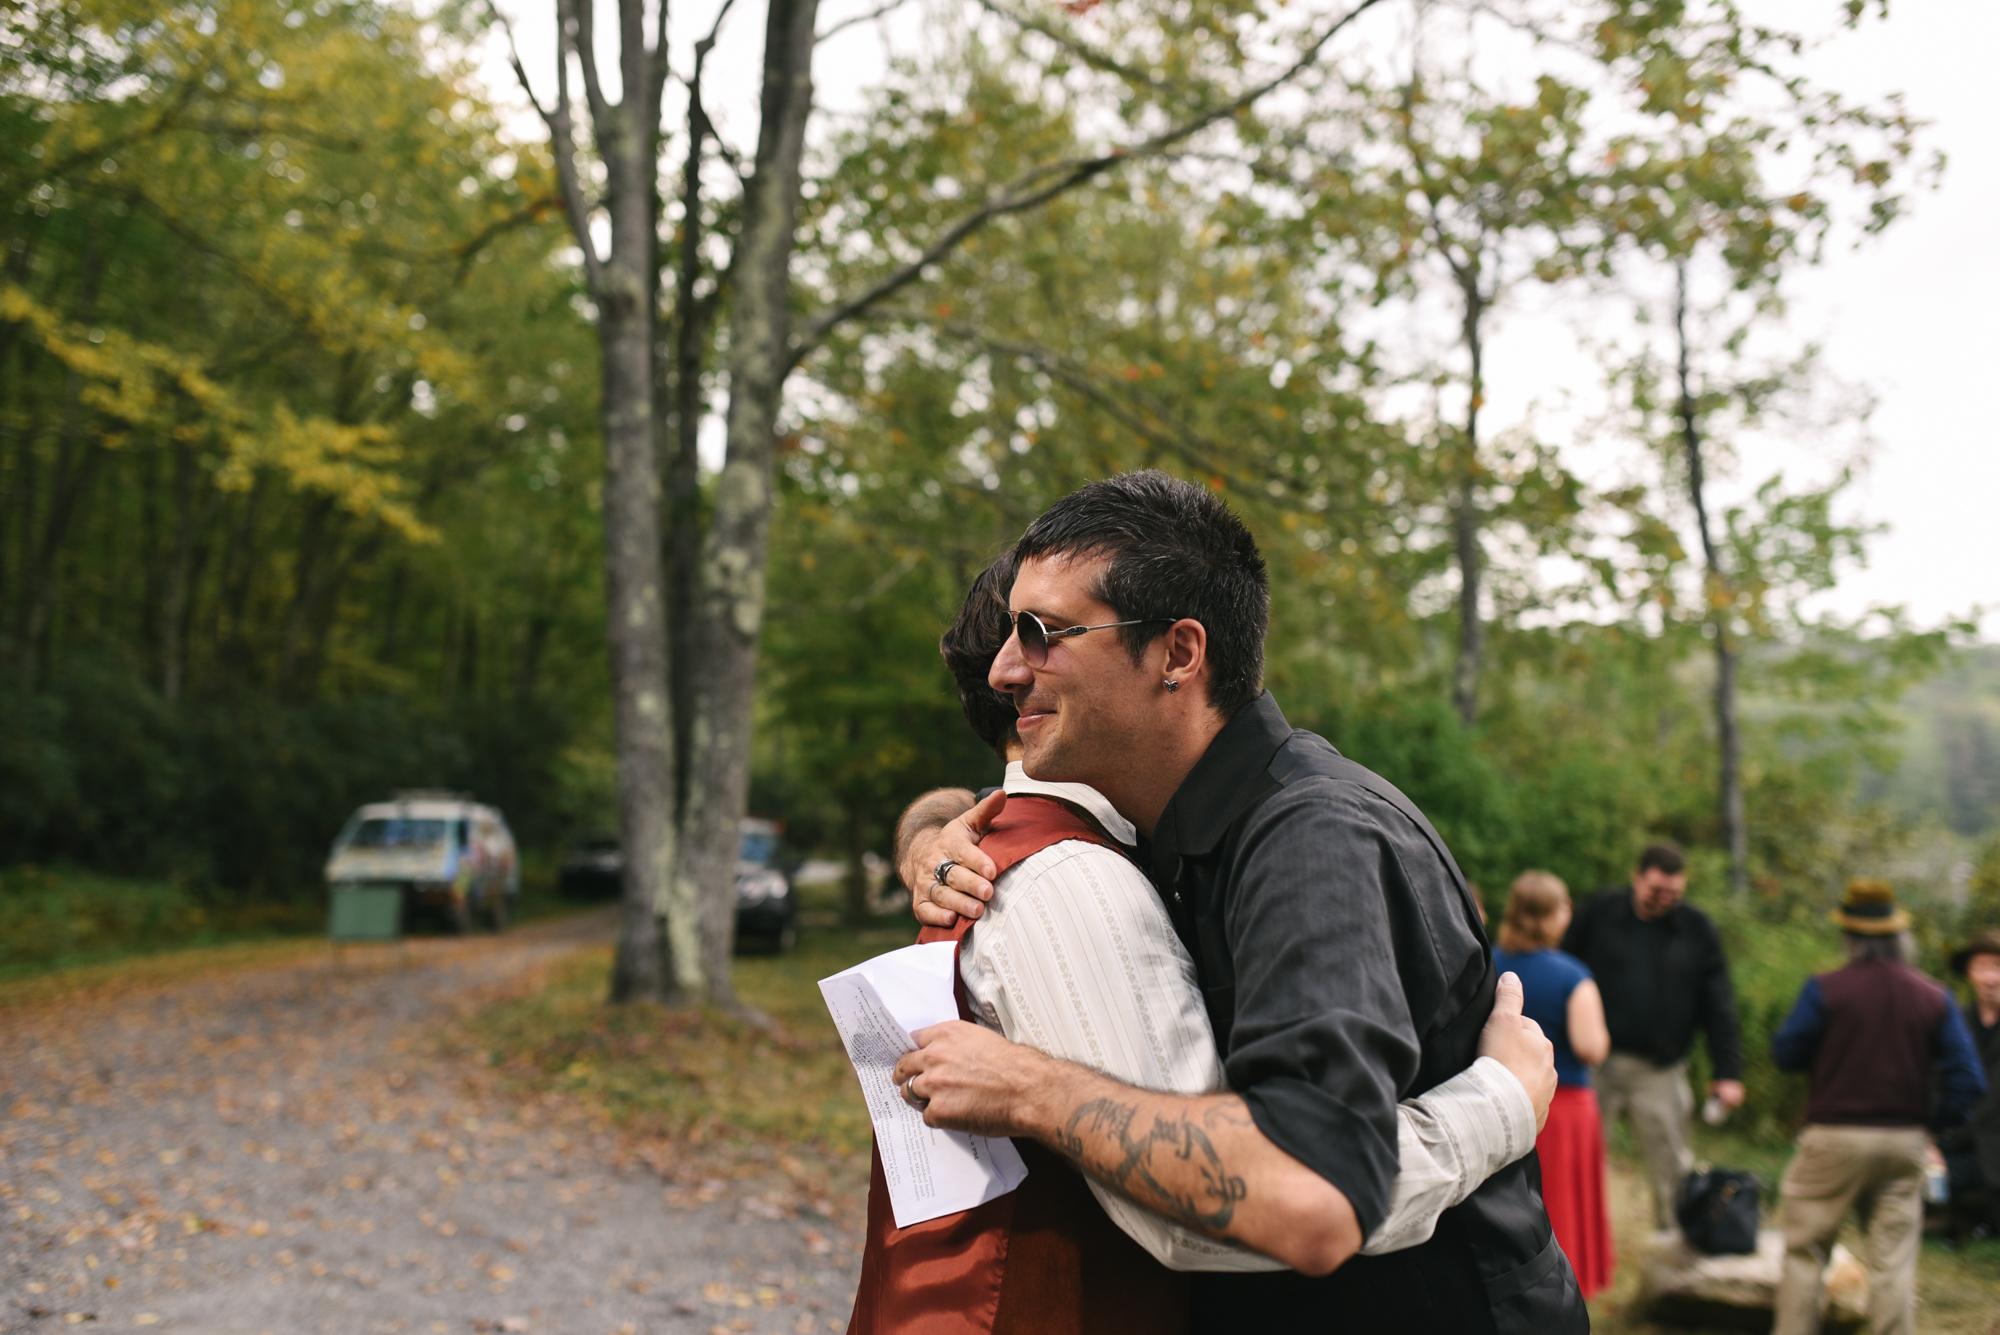 Mountain Wedding, Outdoors, Rustic, West Virginia, Maryland Wedding Photographer, DIY, Casual, Groom greeting guests